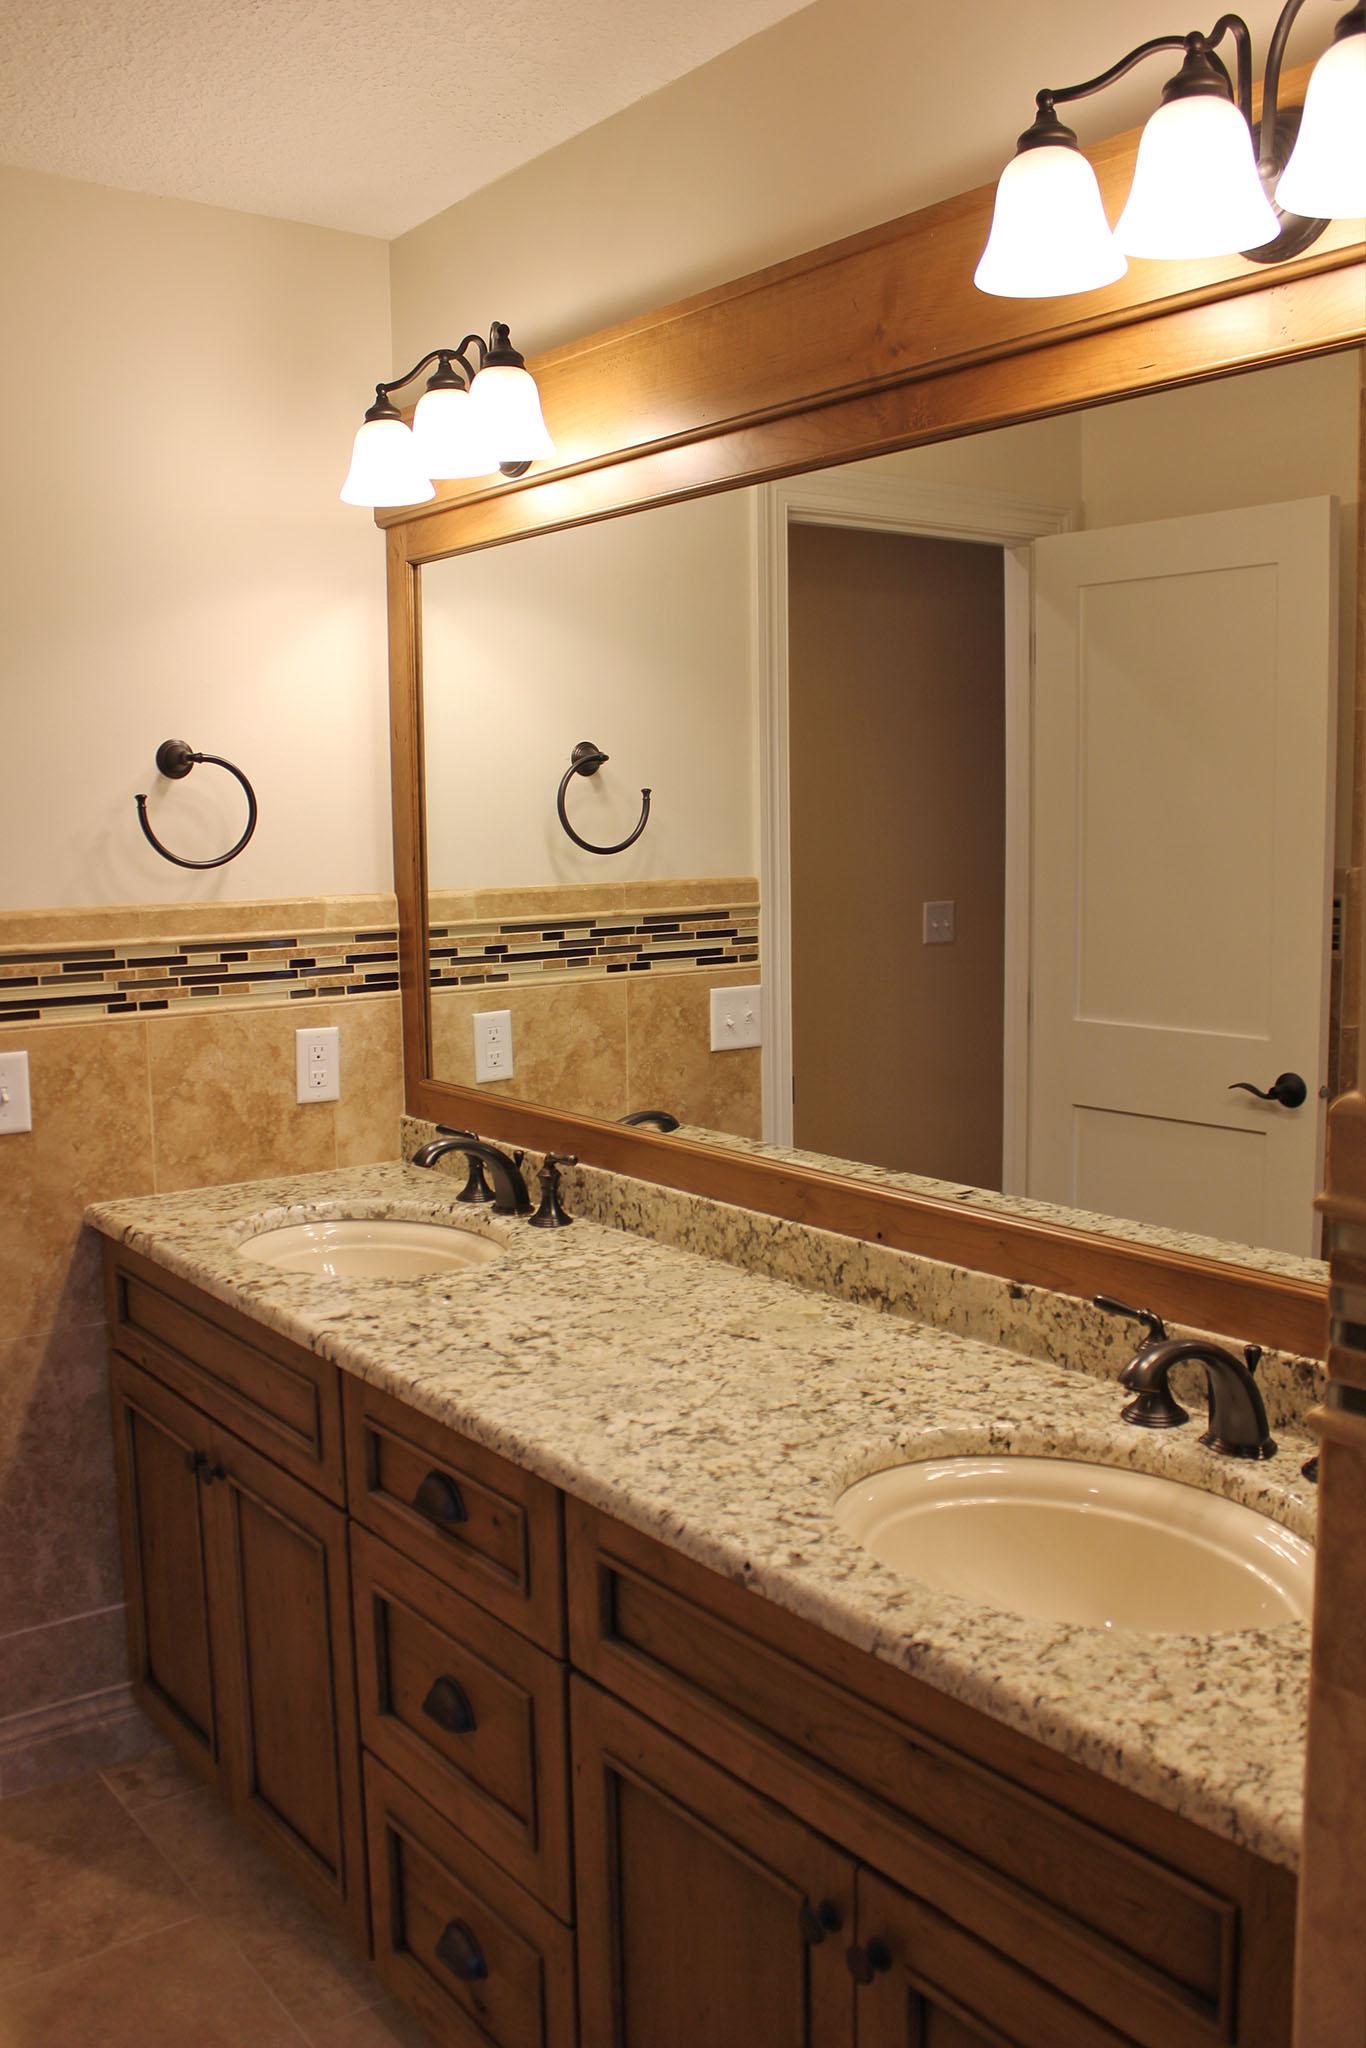 Master bath with custom cabinets, marble tops, undermount sink bowl, tile backsplash and wood framed mirror